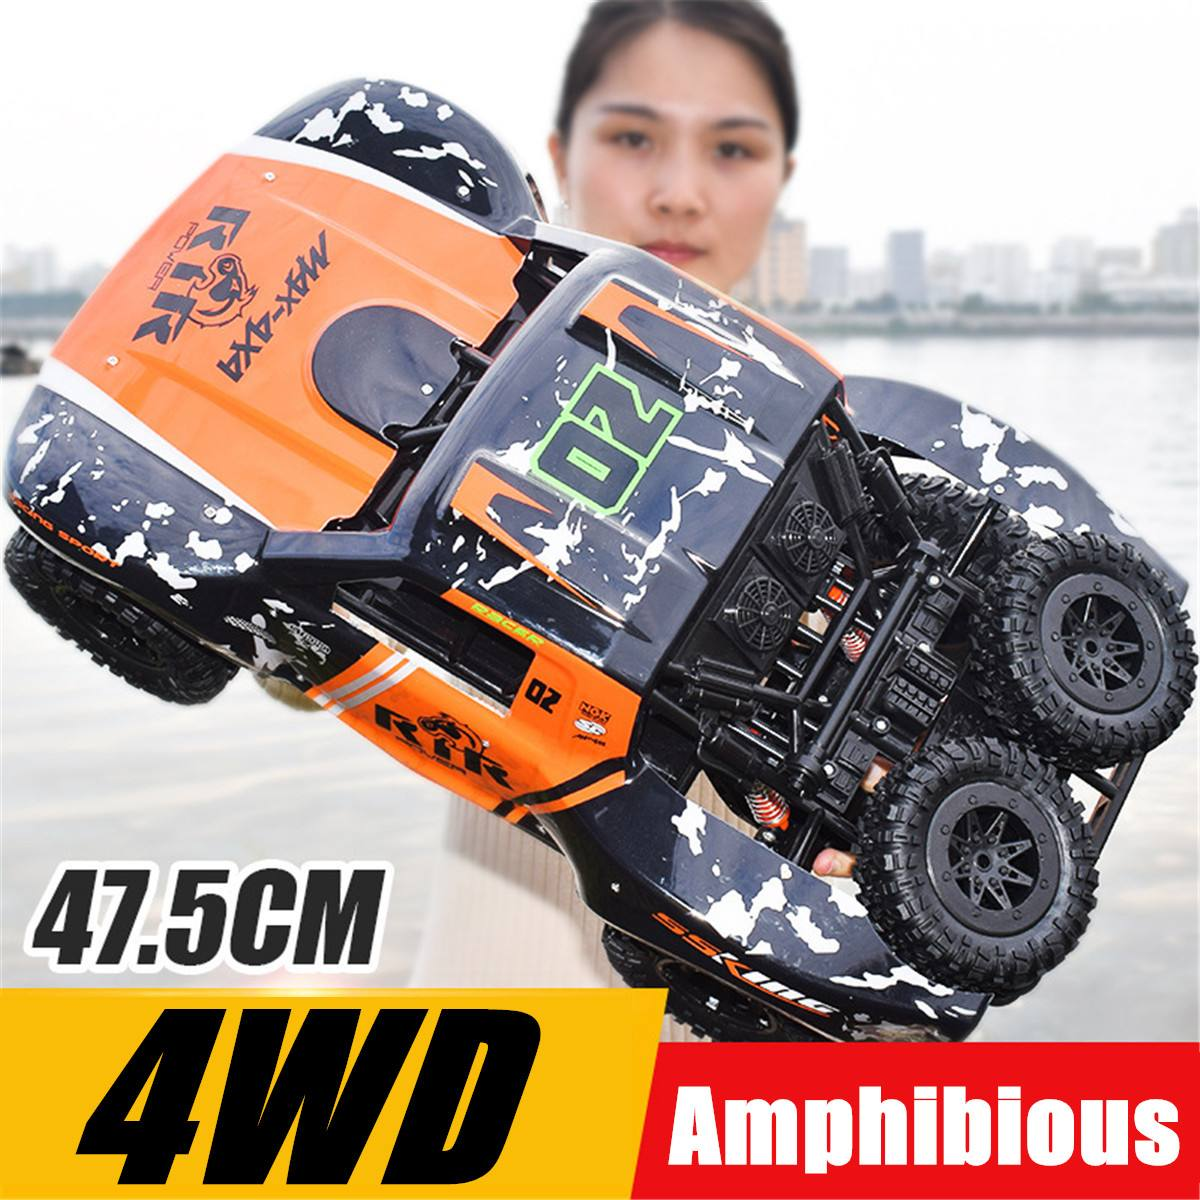 RGT RC Crawler 1:10 4wd RC Car Metal Gear Off Road Truck RC Rock Crawler Cruiser Hobby Crawler RTR 4x4 Waterproof 48cm RC Toy